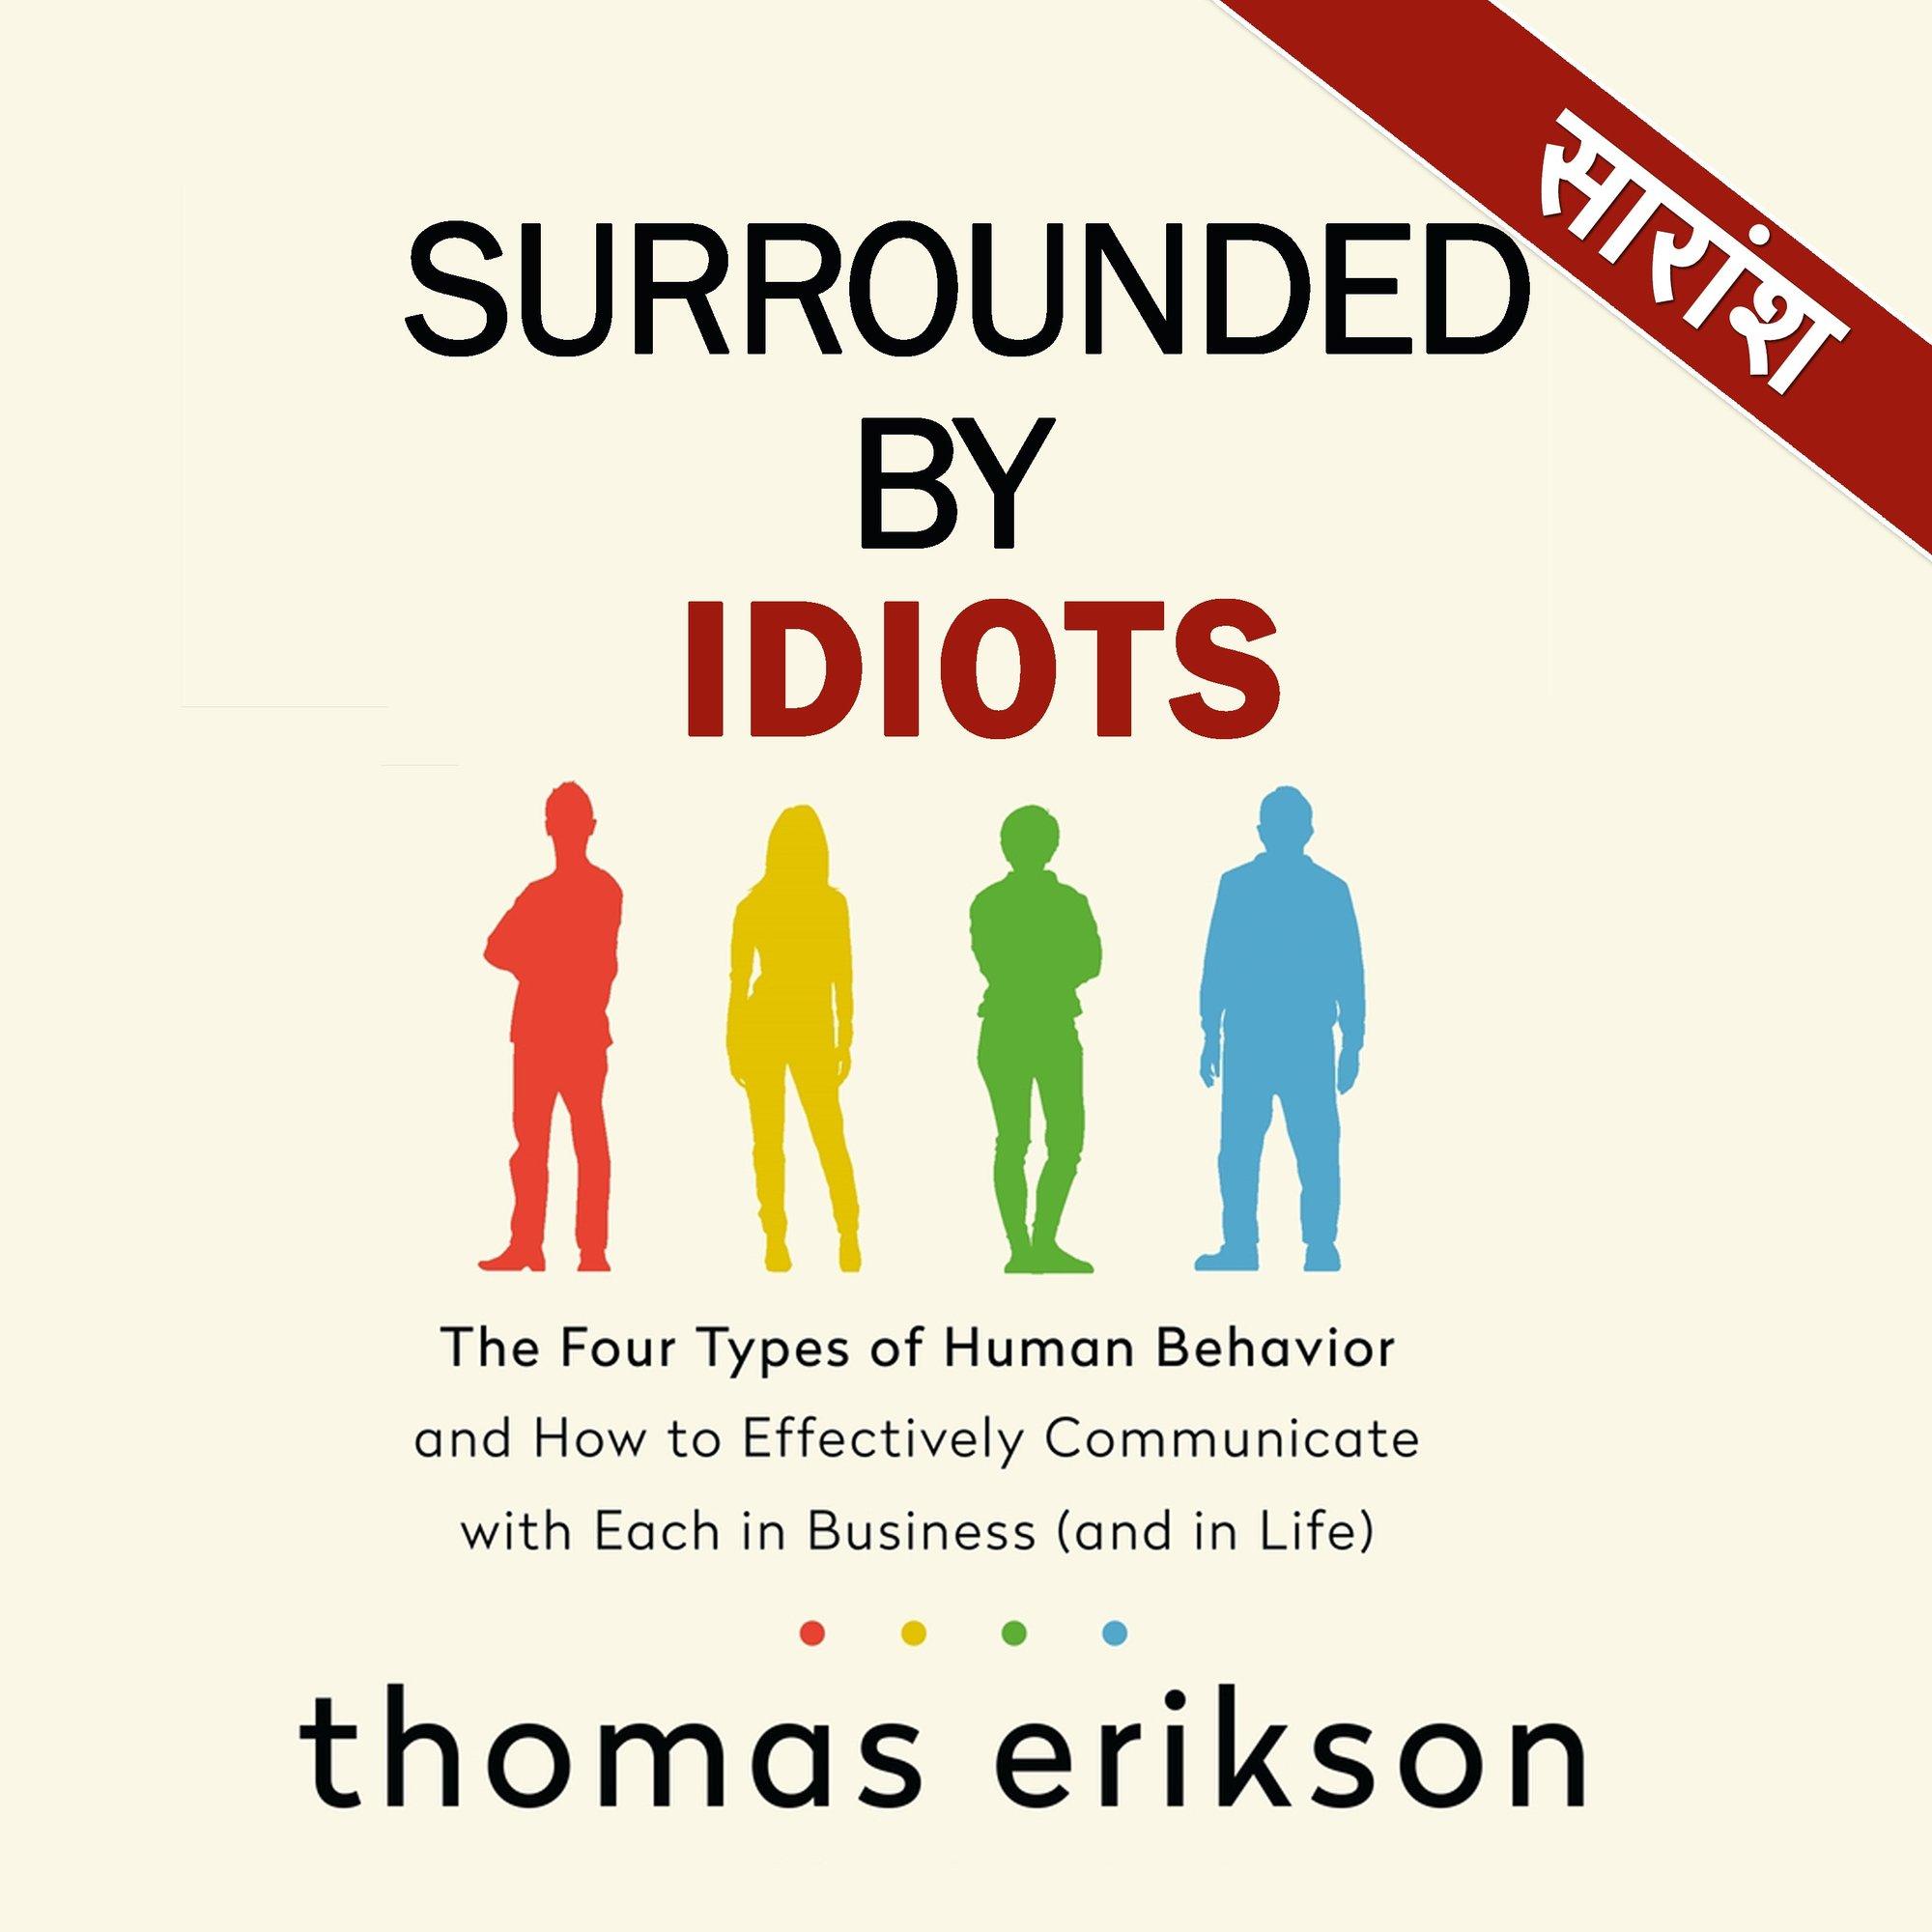 सरारूंडेड बाय इडियट्स - थॉमस एरिक्सन  |